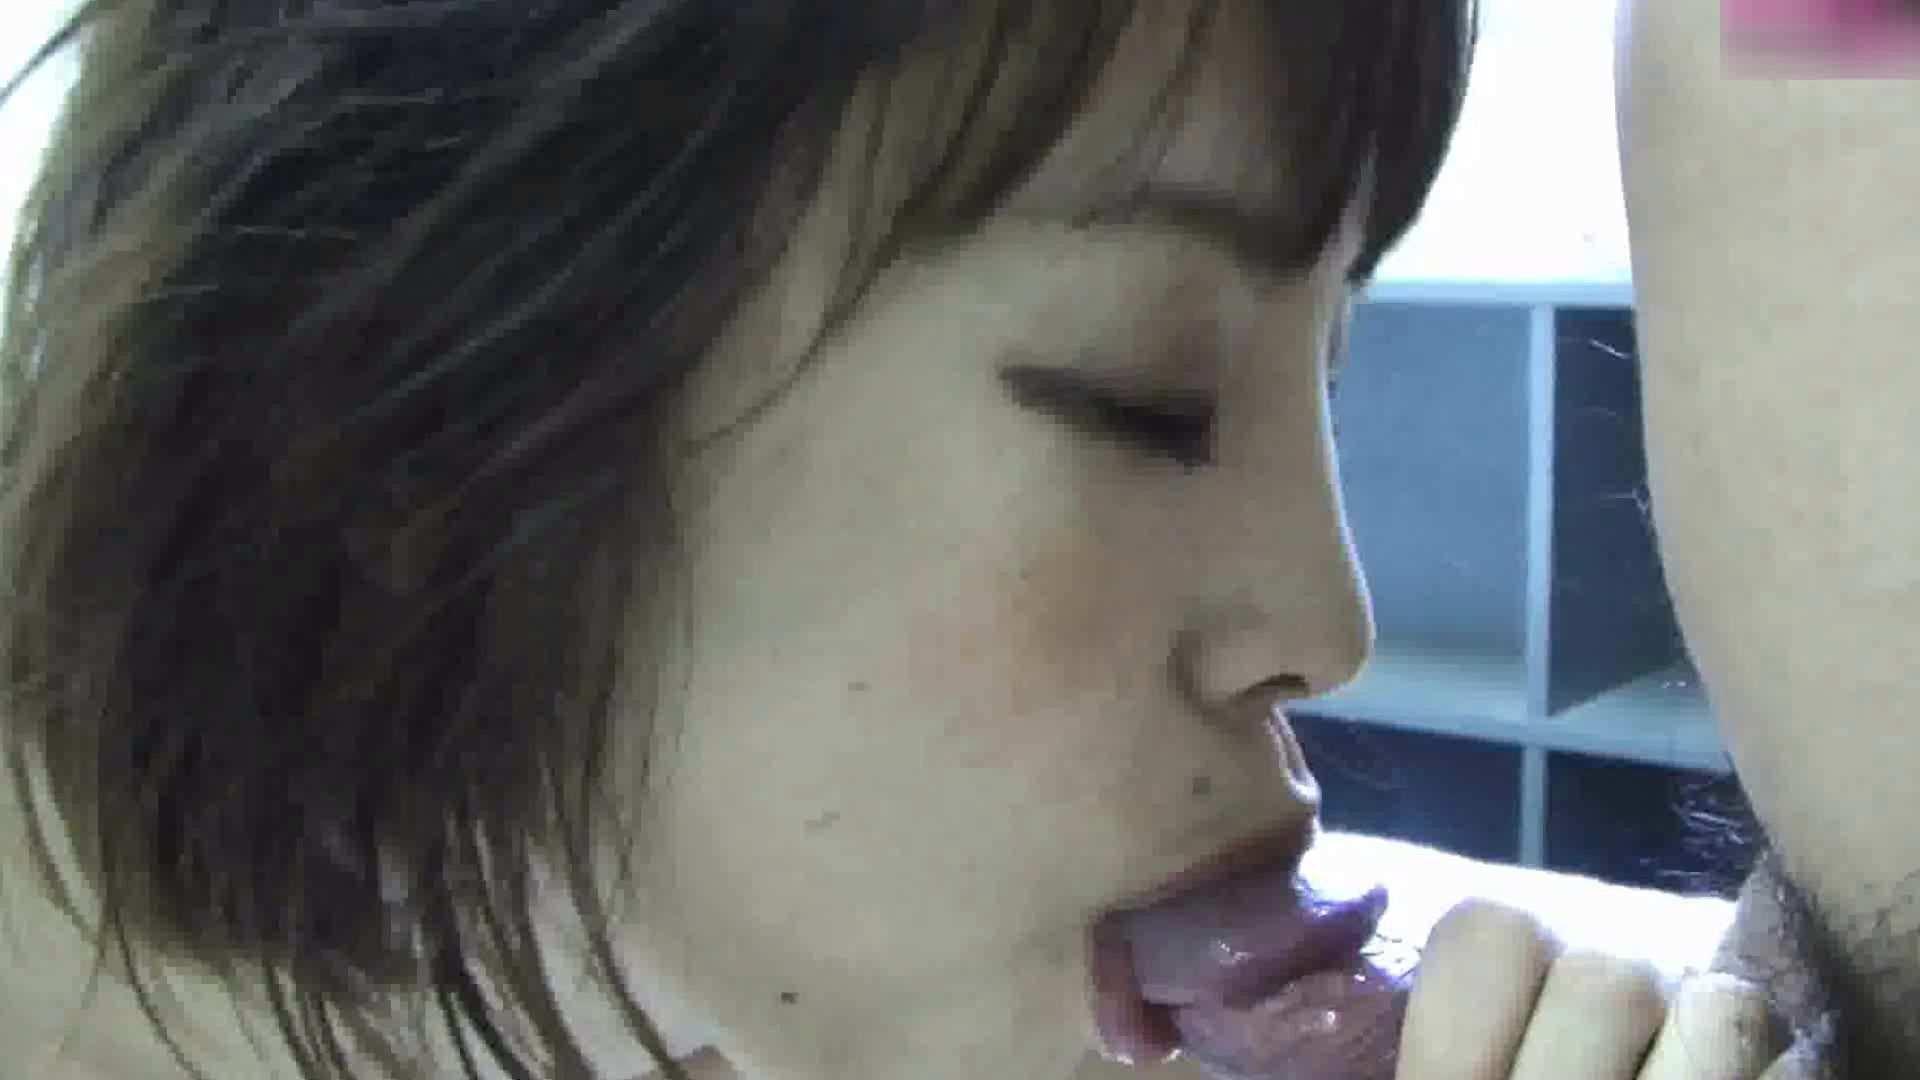 S級厳選美女ビッチガールVol.26 ギャルヌード おまんこ無修正動画無料 72画像 66